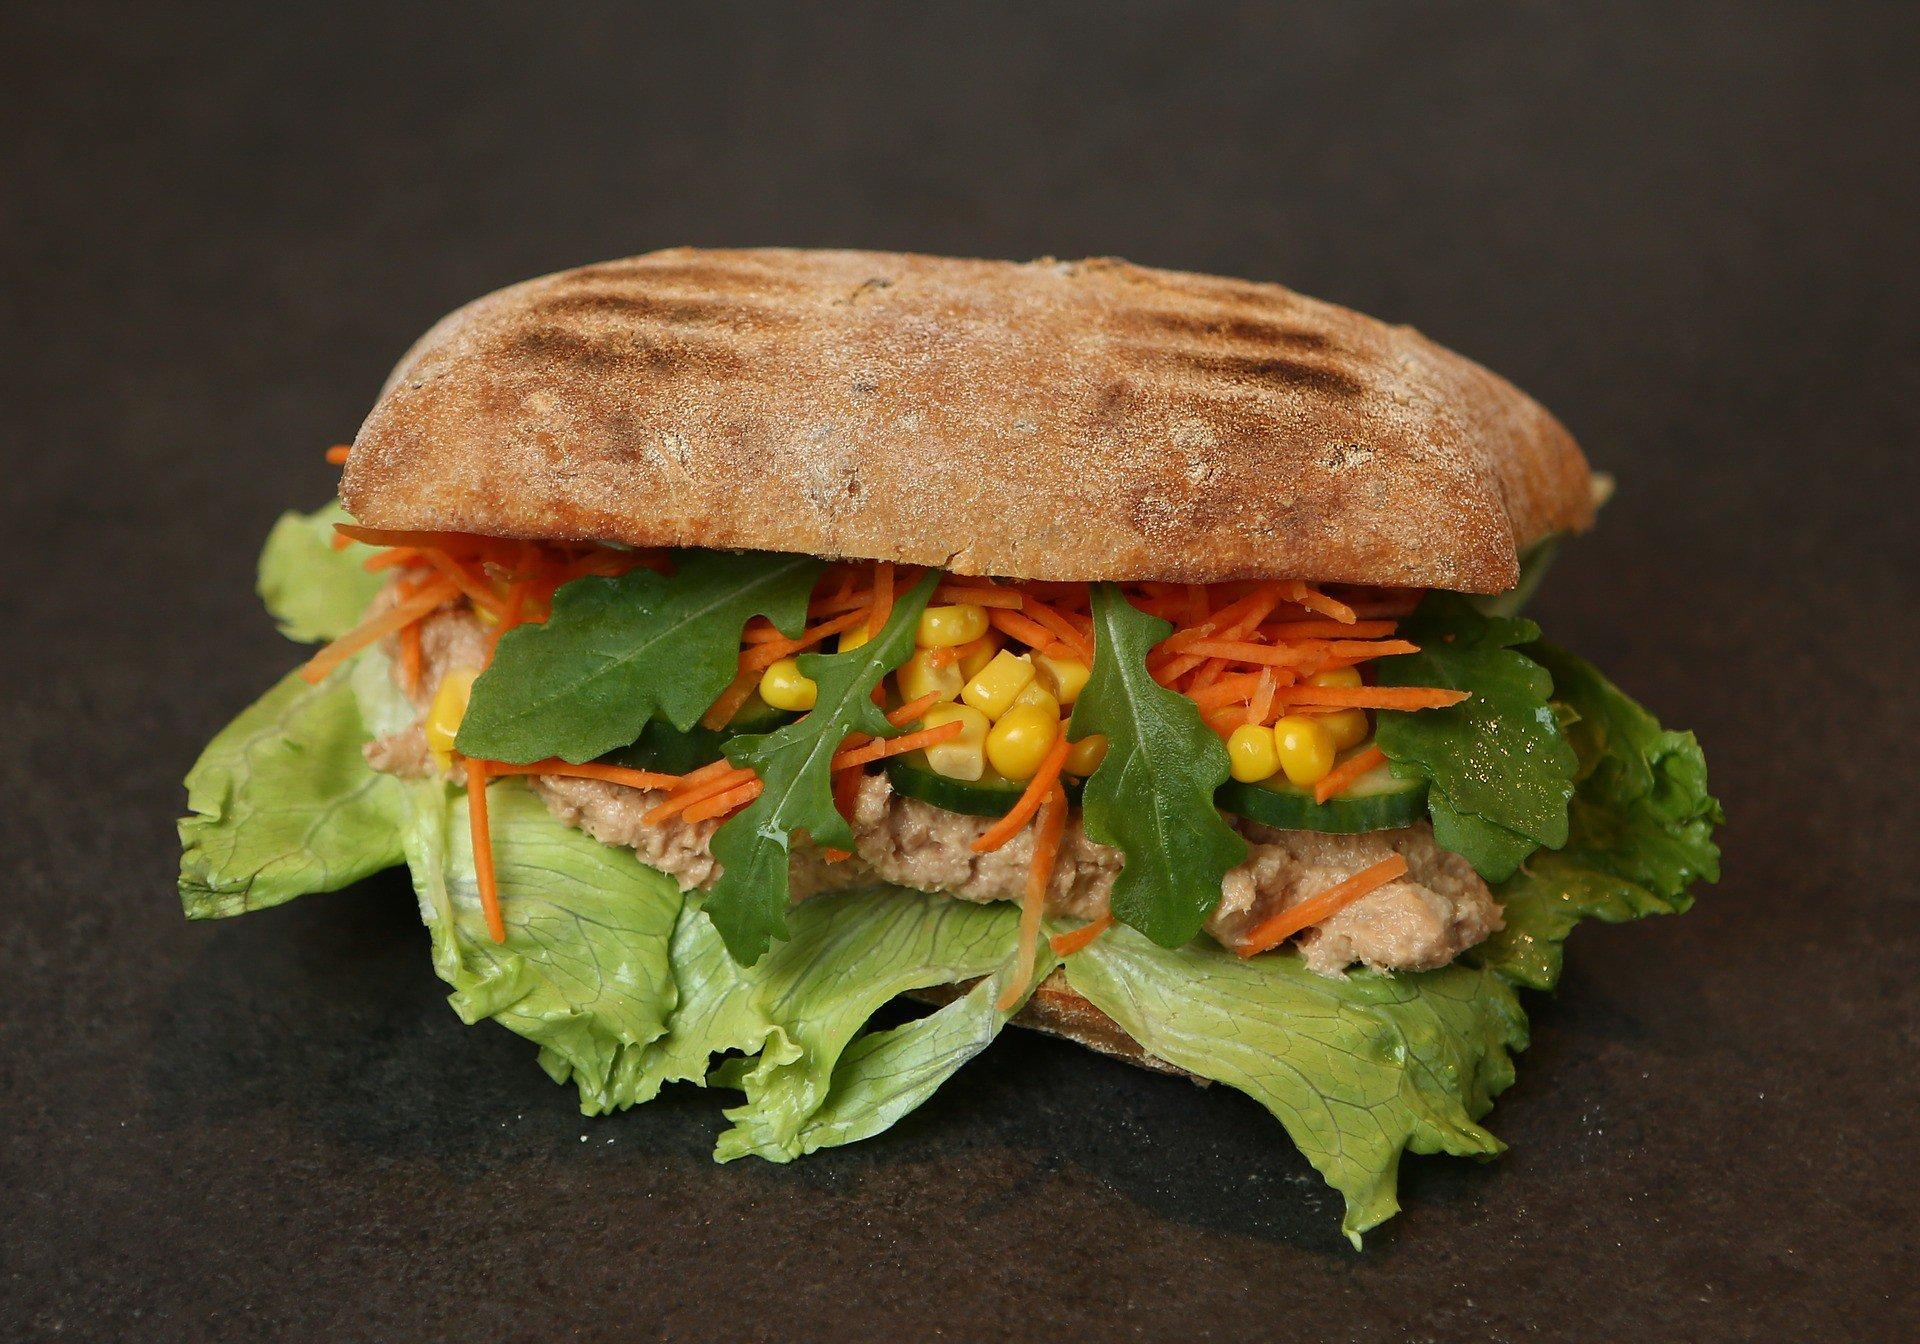 sandwich 1580348 1920